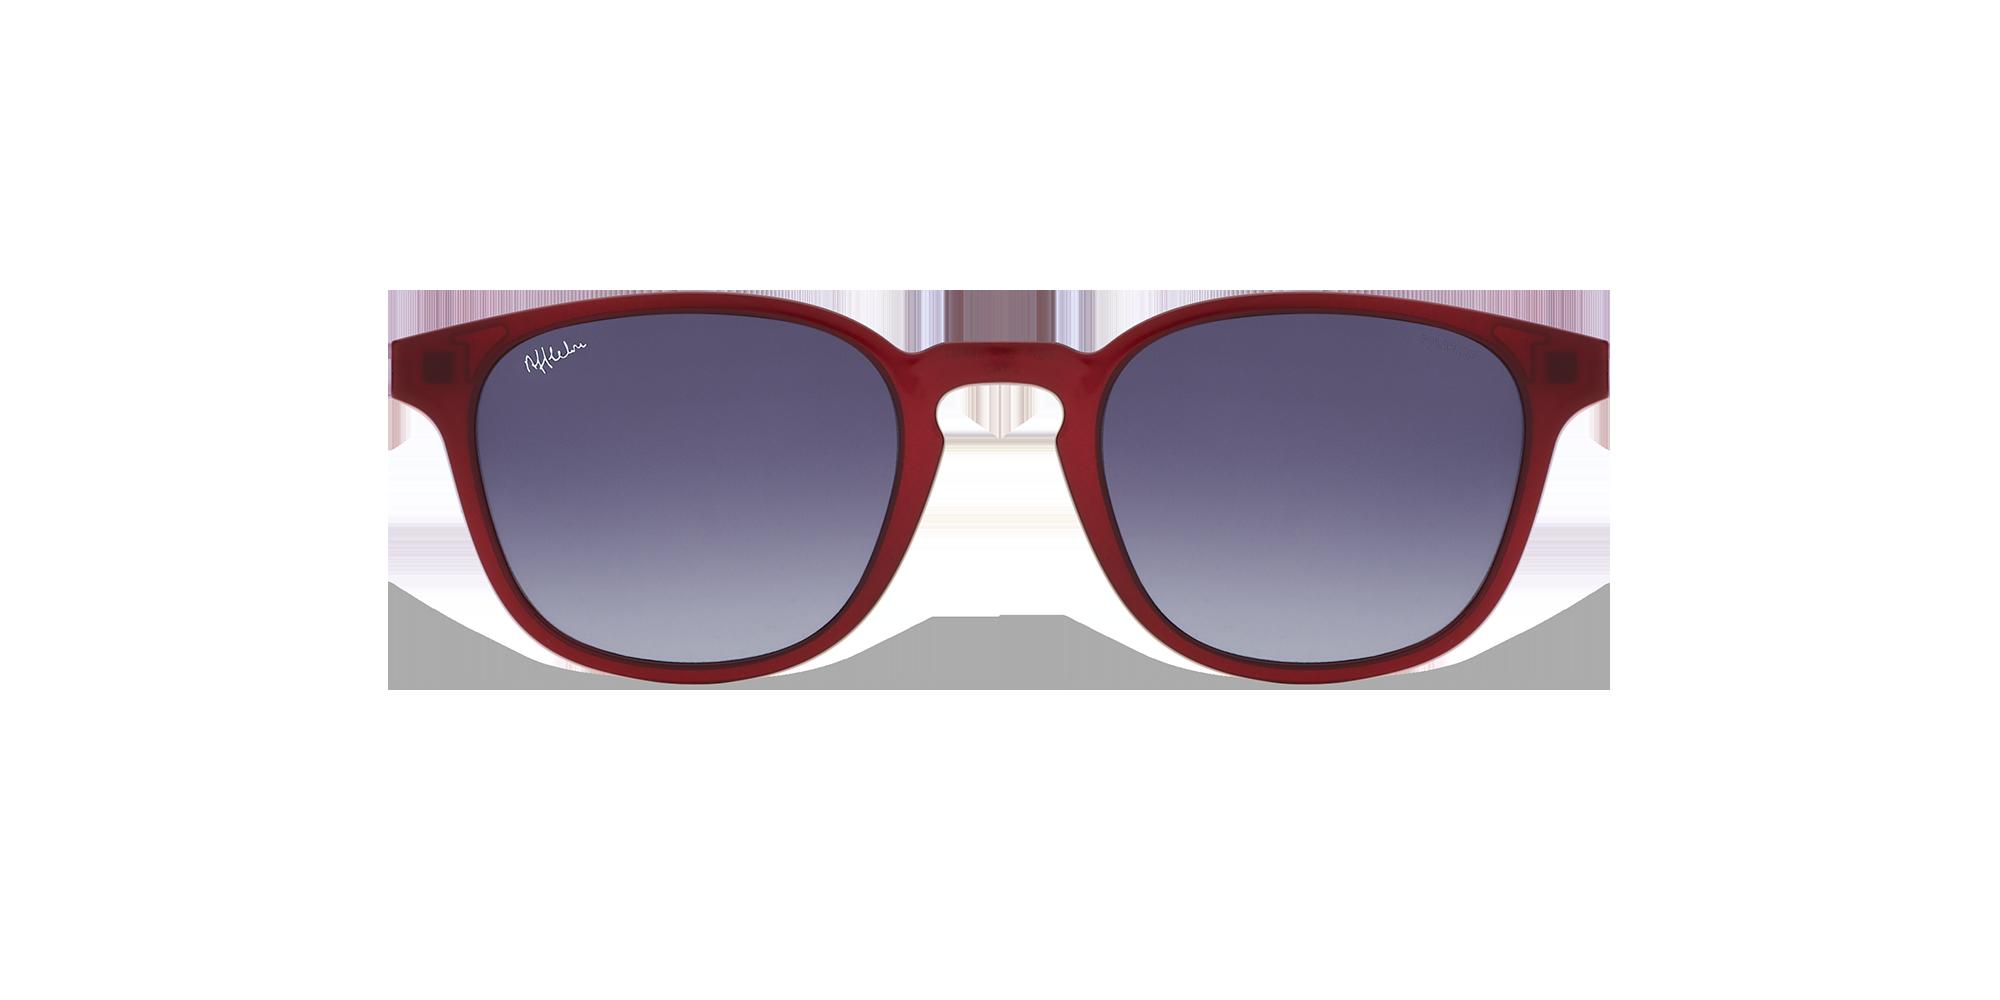 afflelou/france/products/smart_clip/clips_glasses/07630036429181_face.png